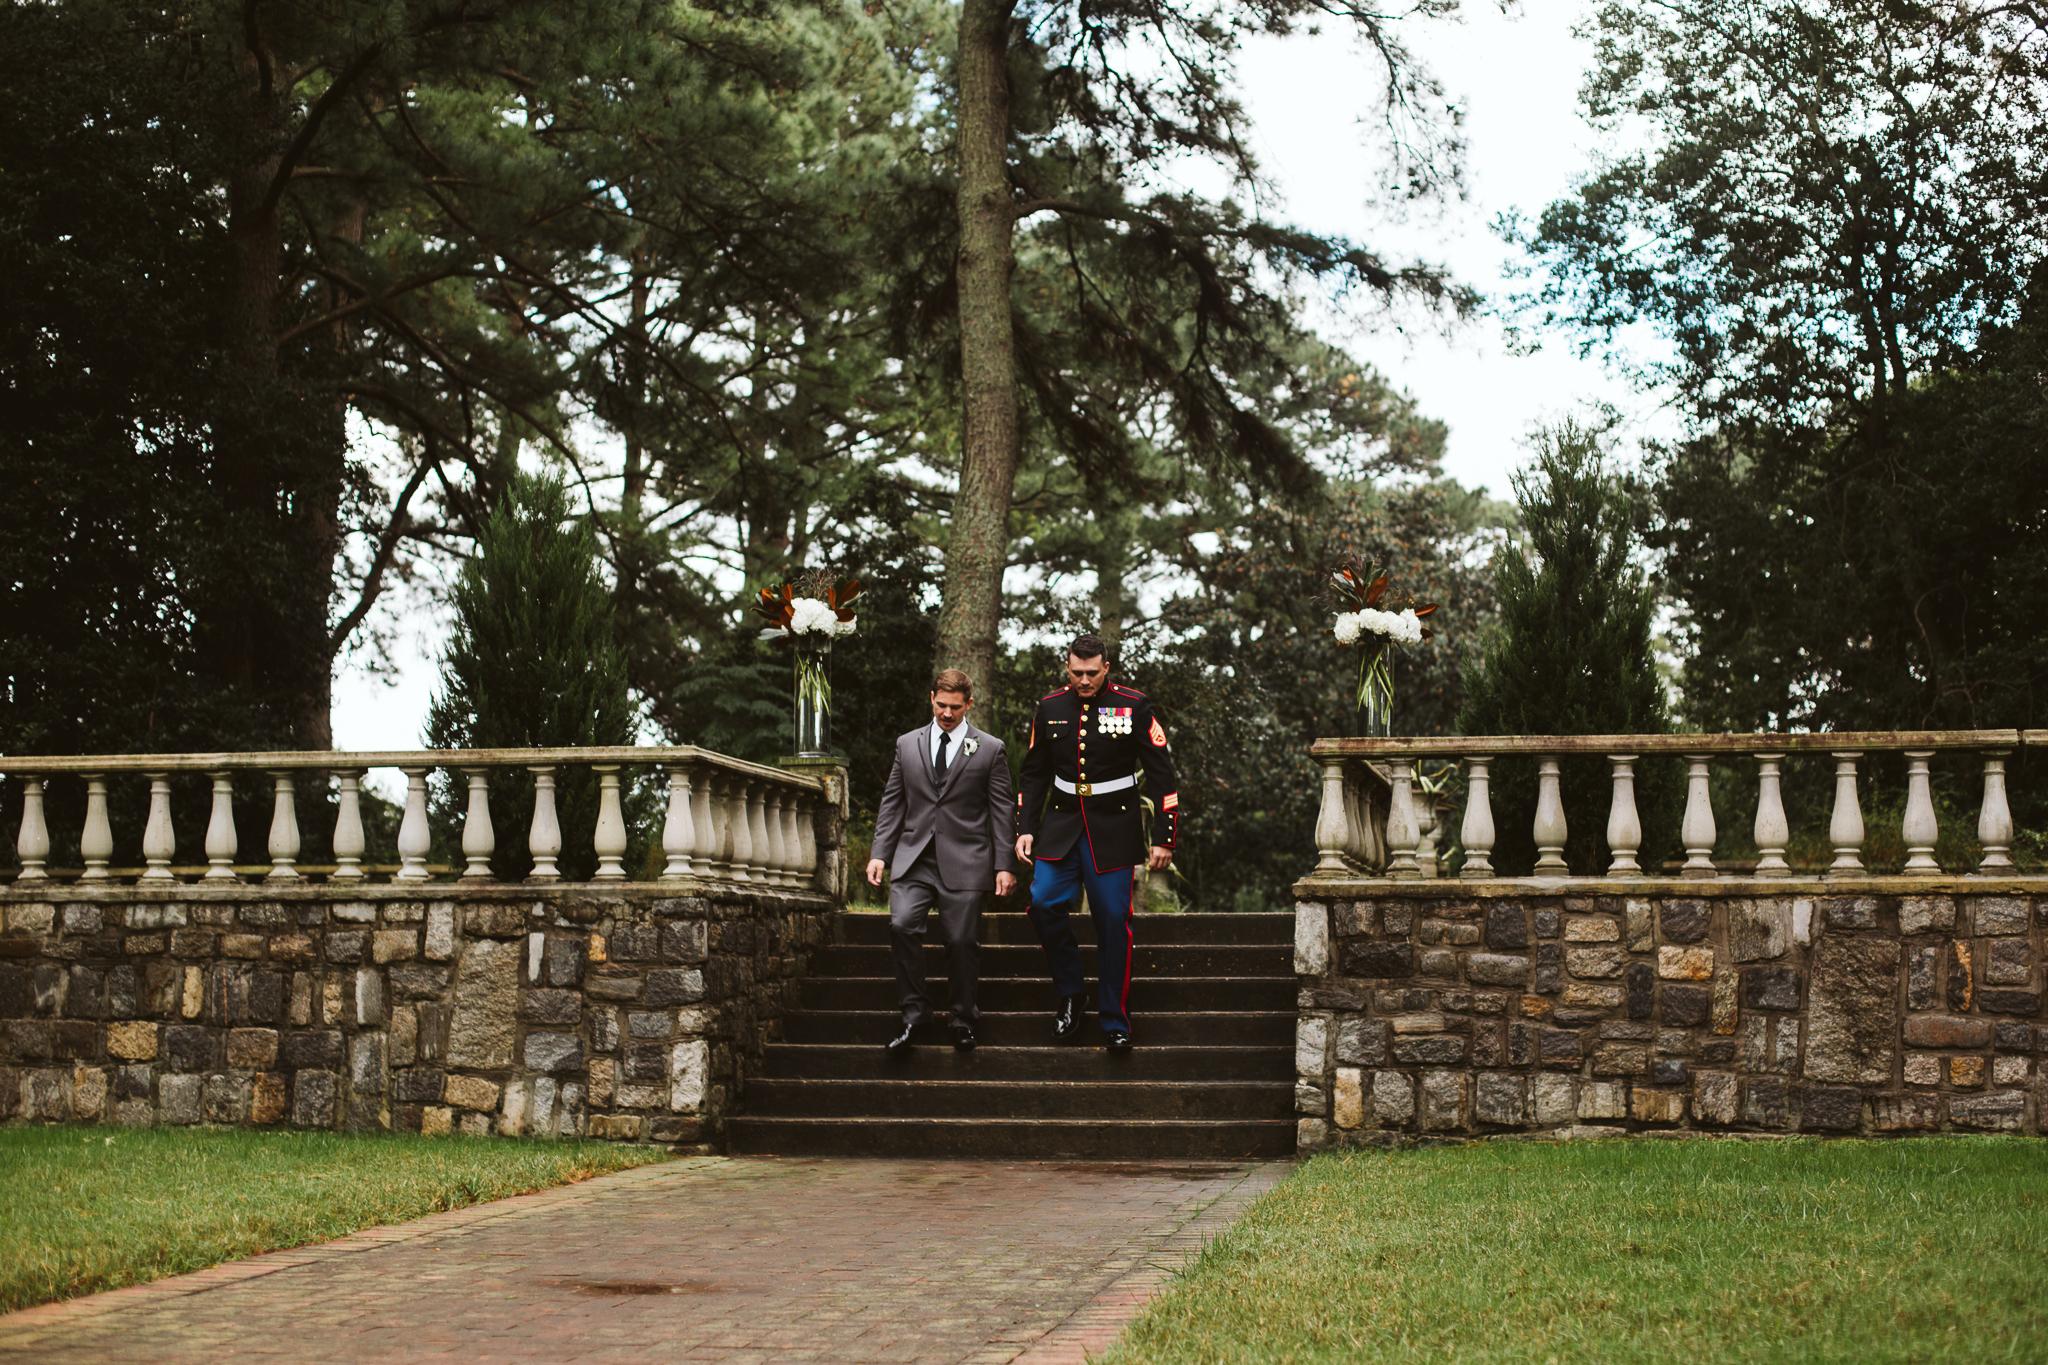 hamptonroads_wedding_norfolk_botanical_gardens-39.JPG